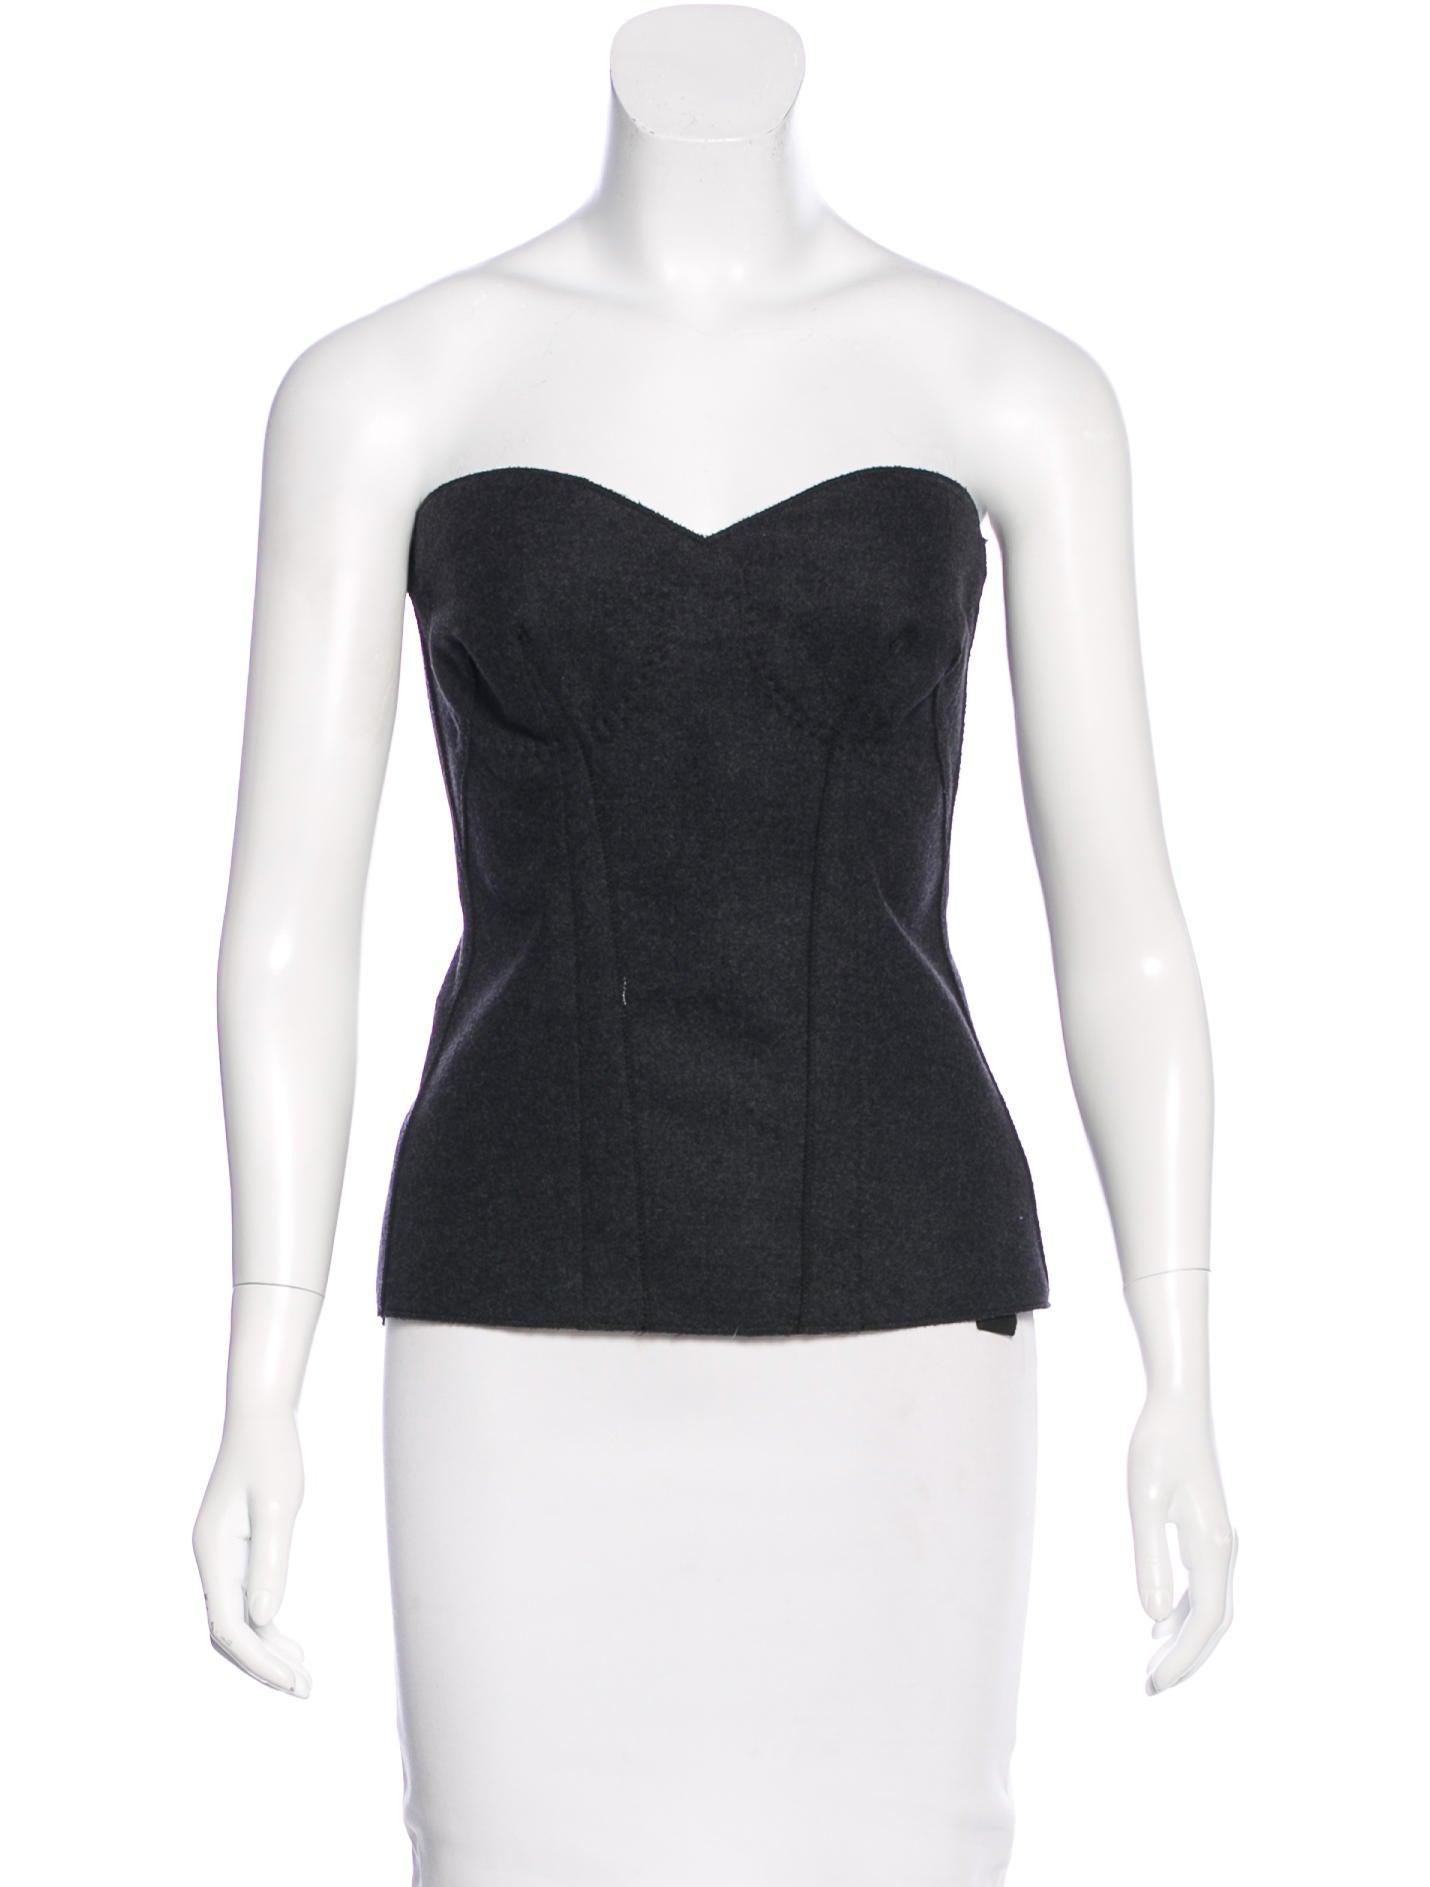 Prada wool corset top clothing pra133975 the realreal for Best wool shirt jackets